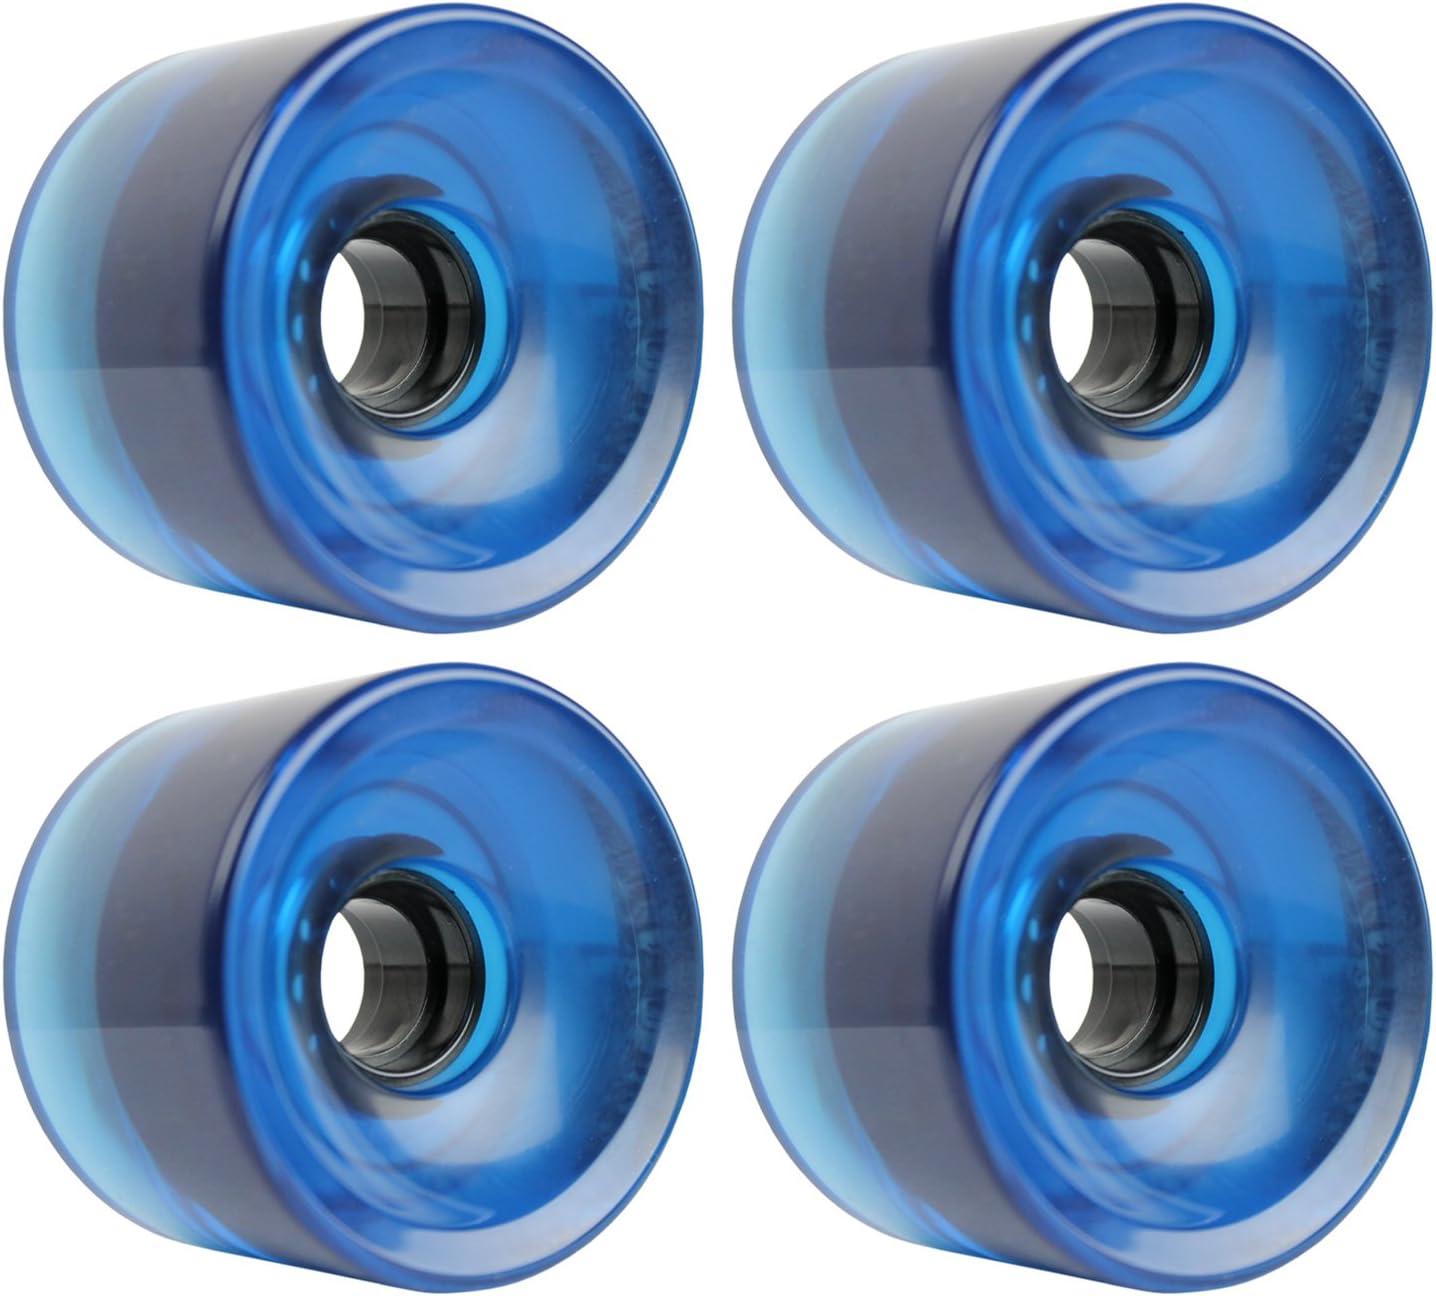 70mm x 51.5mm KSS 647C Longboard Cruiser 83A 4 Wheel Set Blue